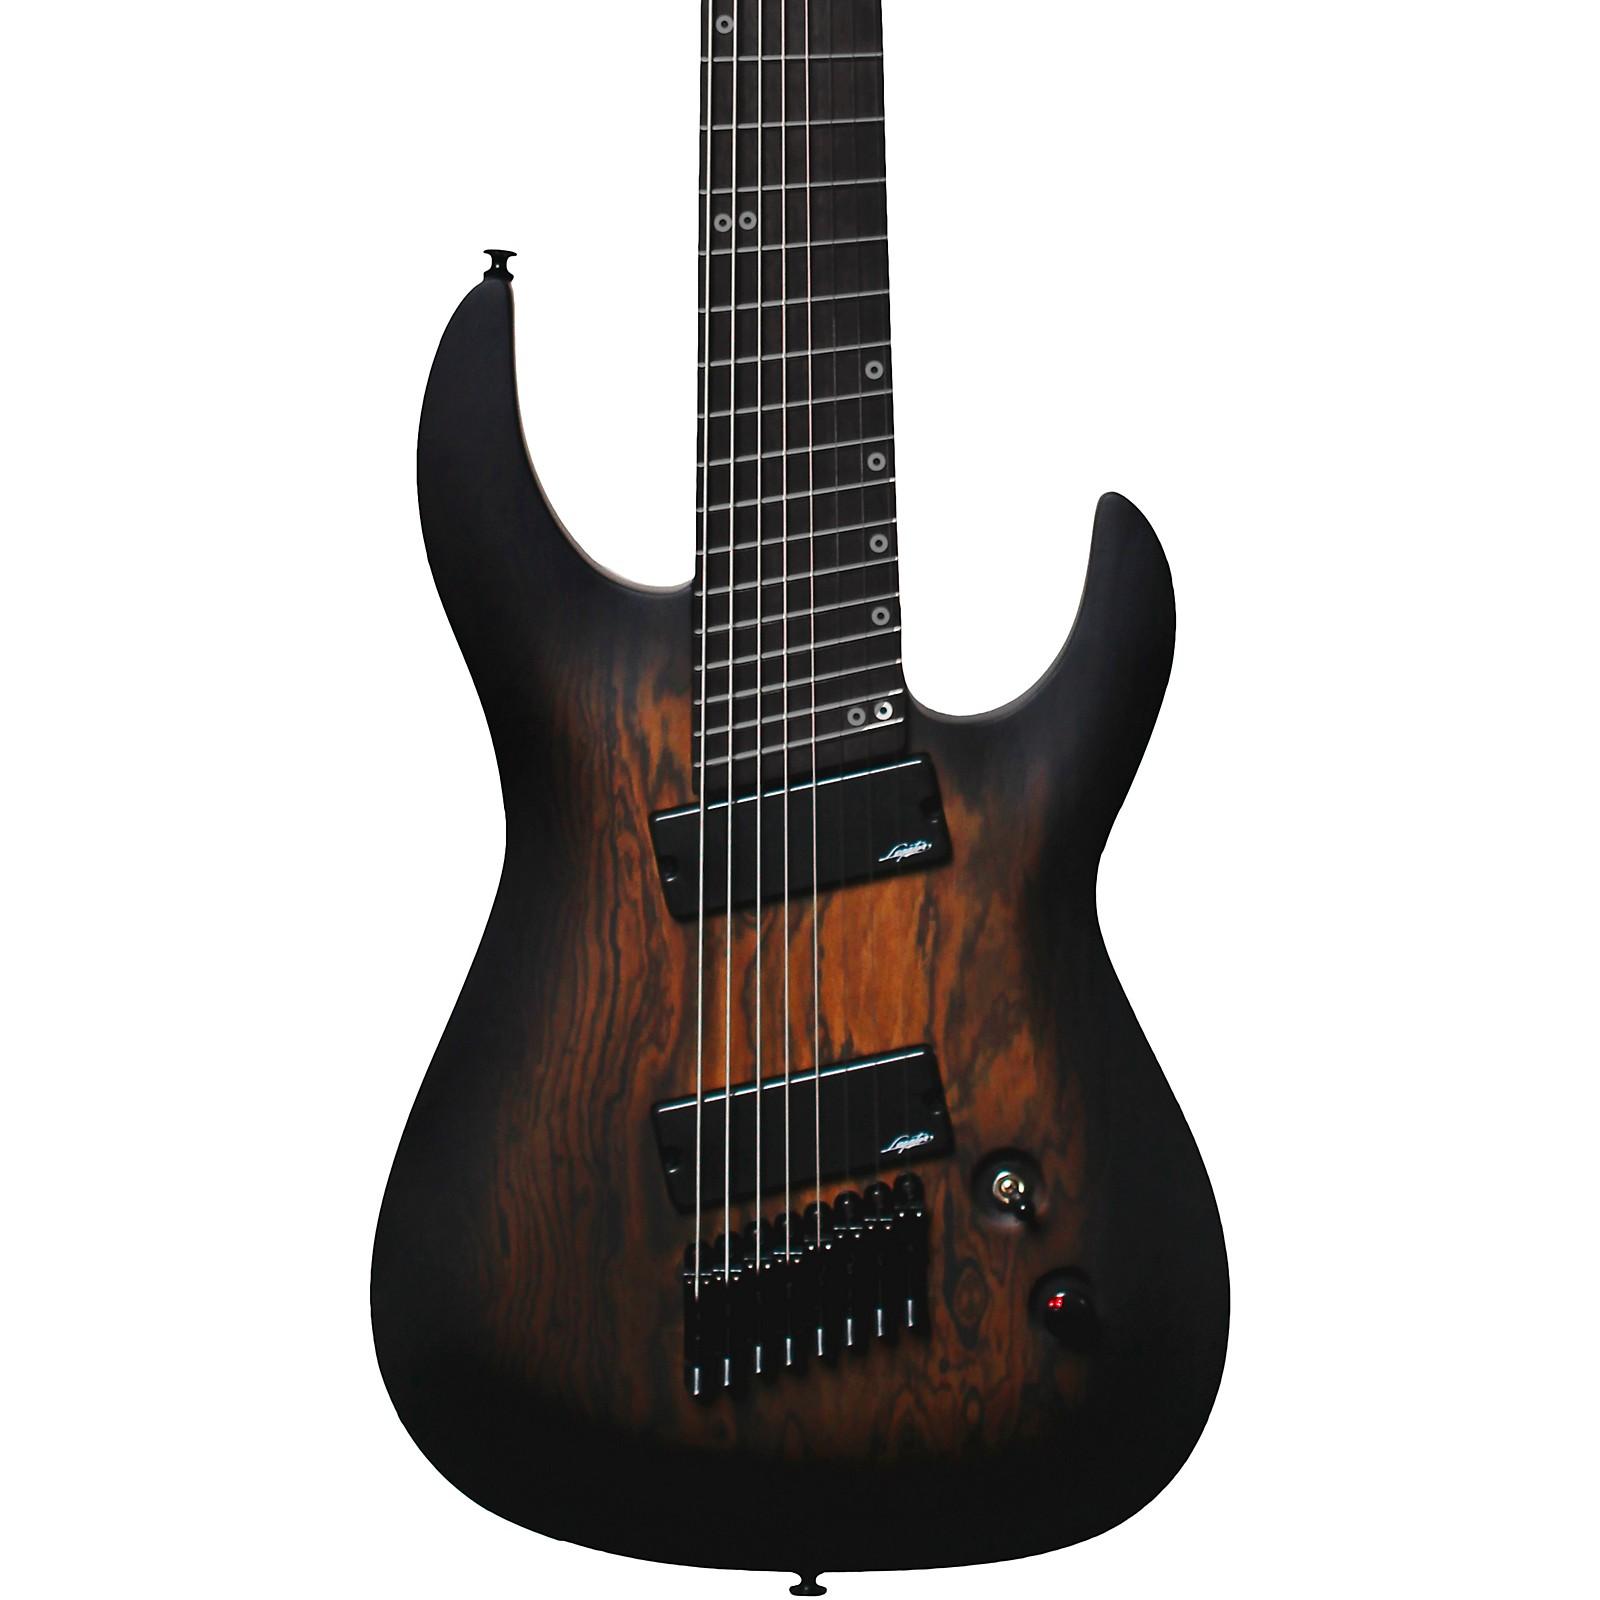 Legator Ninja Performance 8 Multi-Scale Ebony Fingerboard Electric Guitar